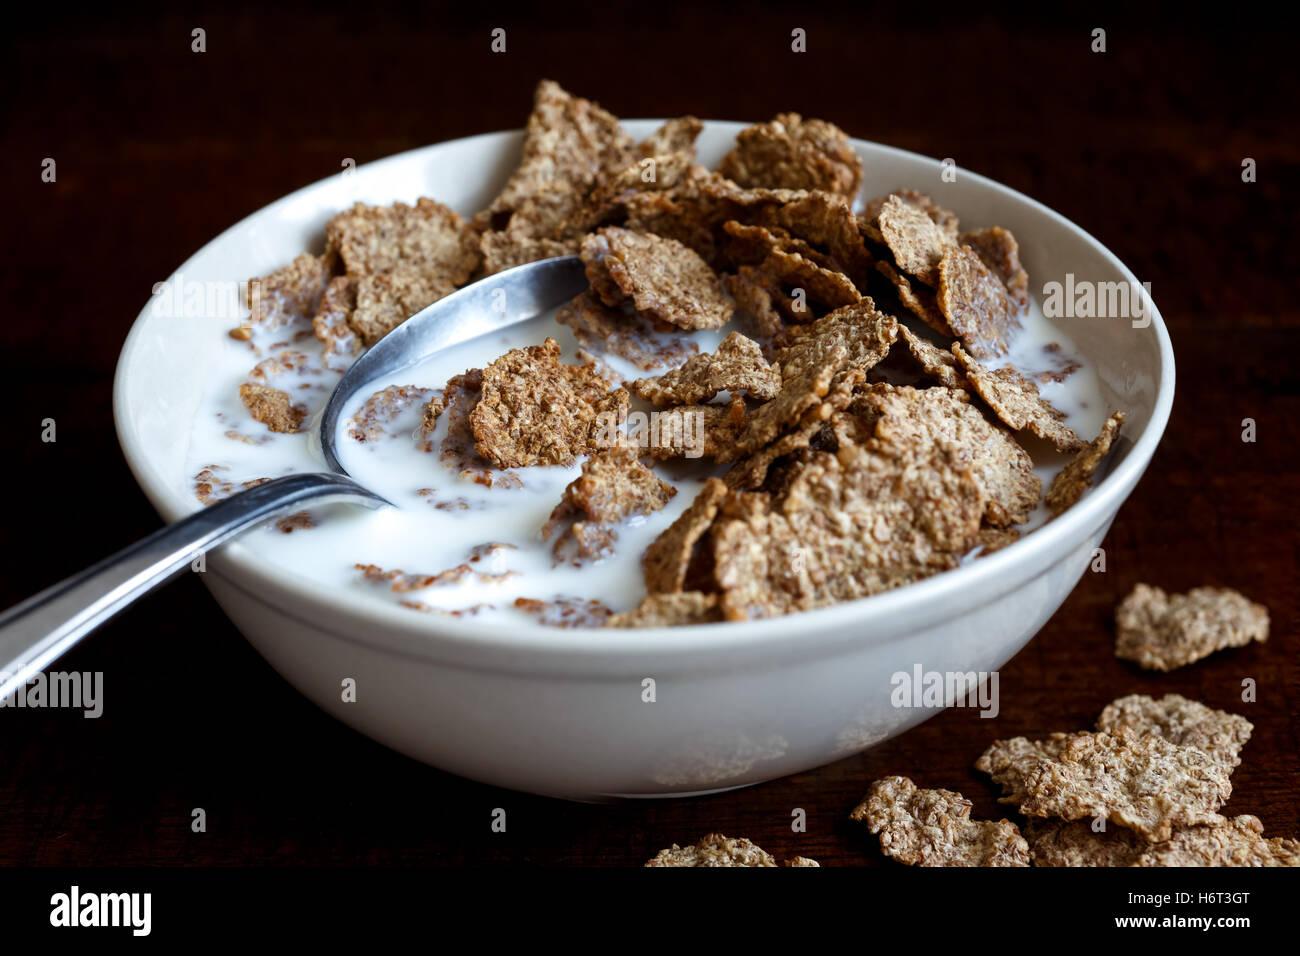 Half eaten wheat bran breakfast cereal with milk in ceramic